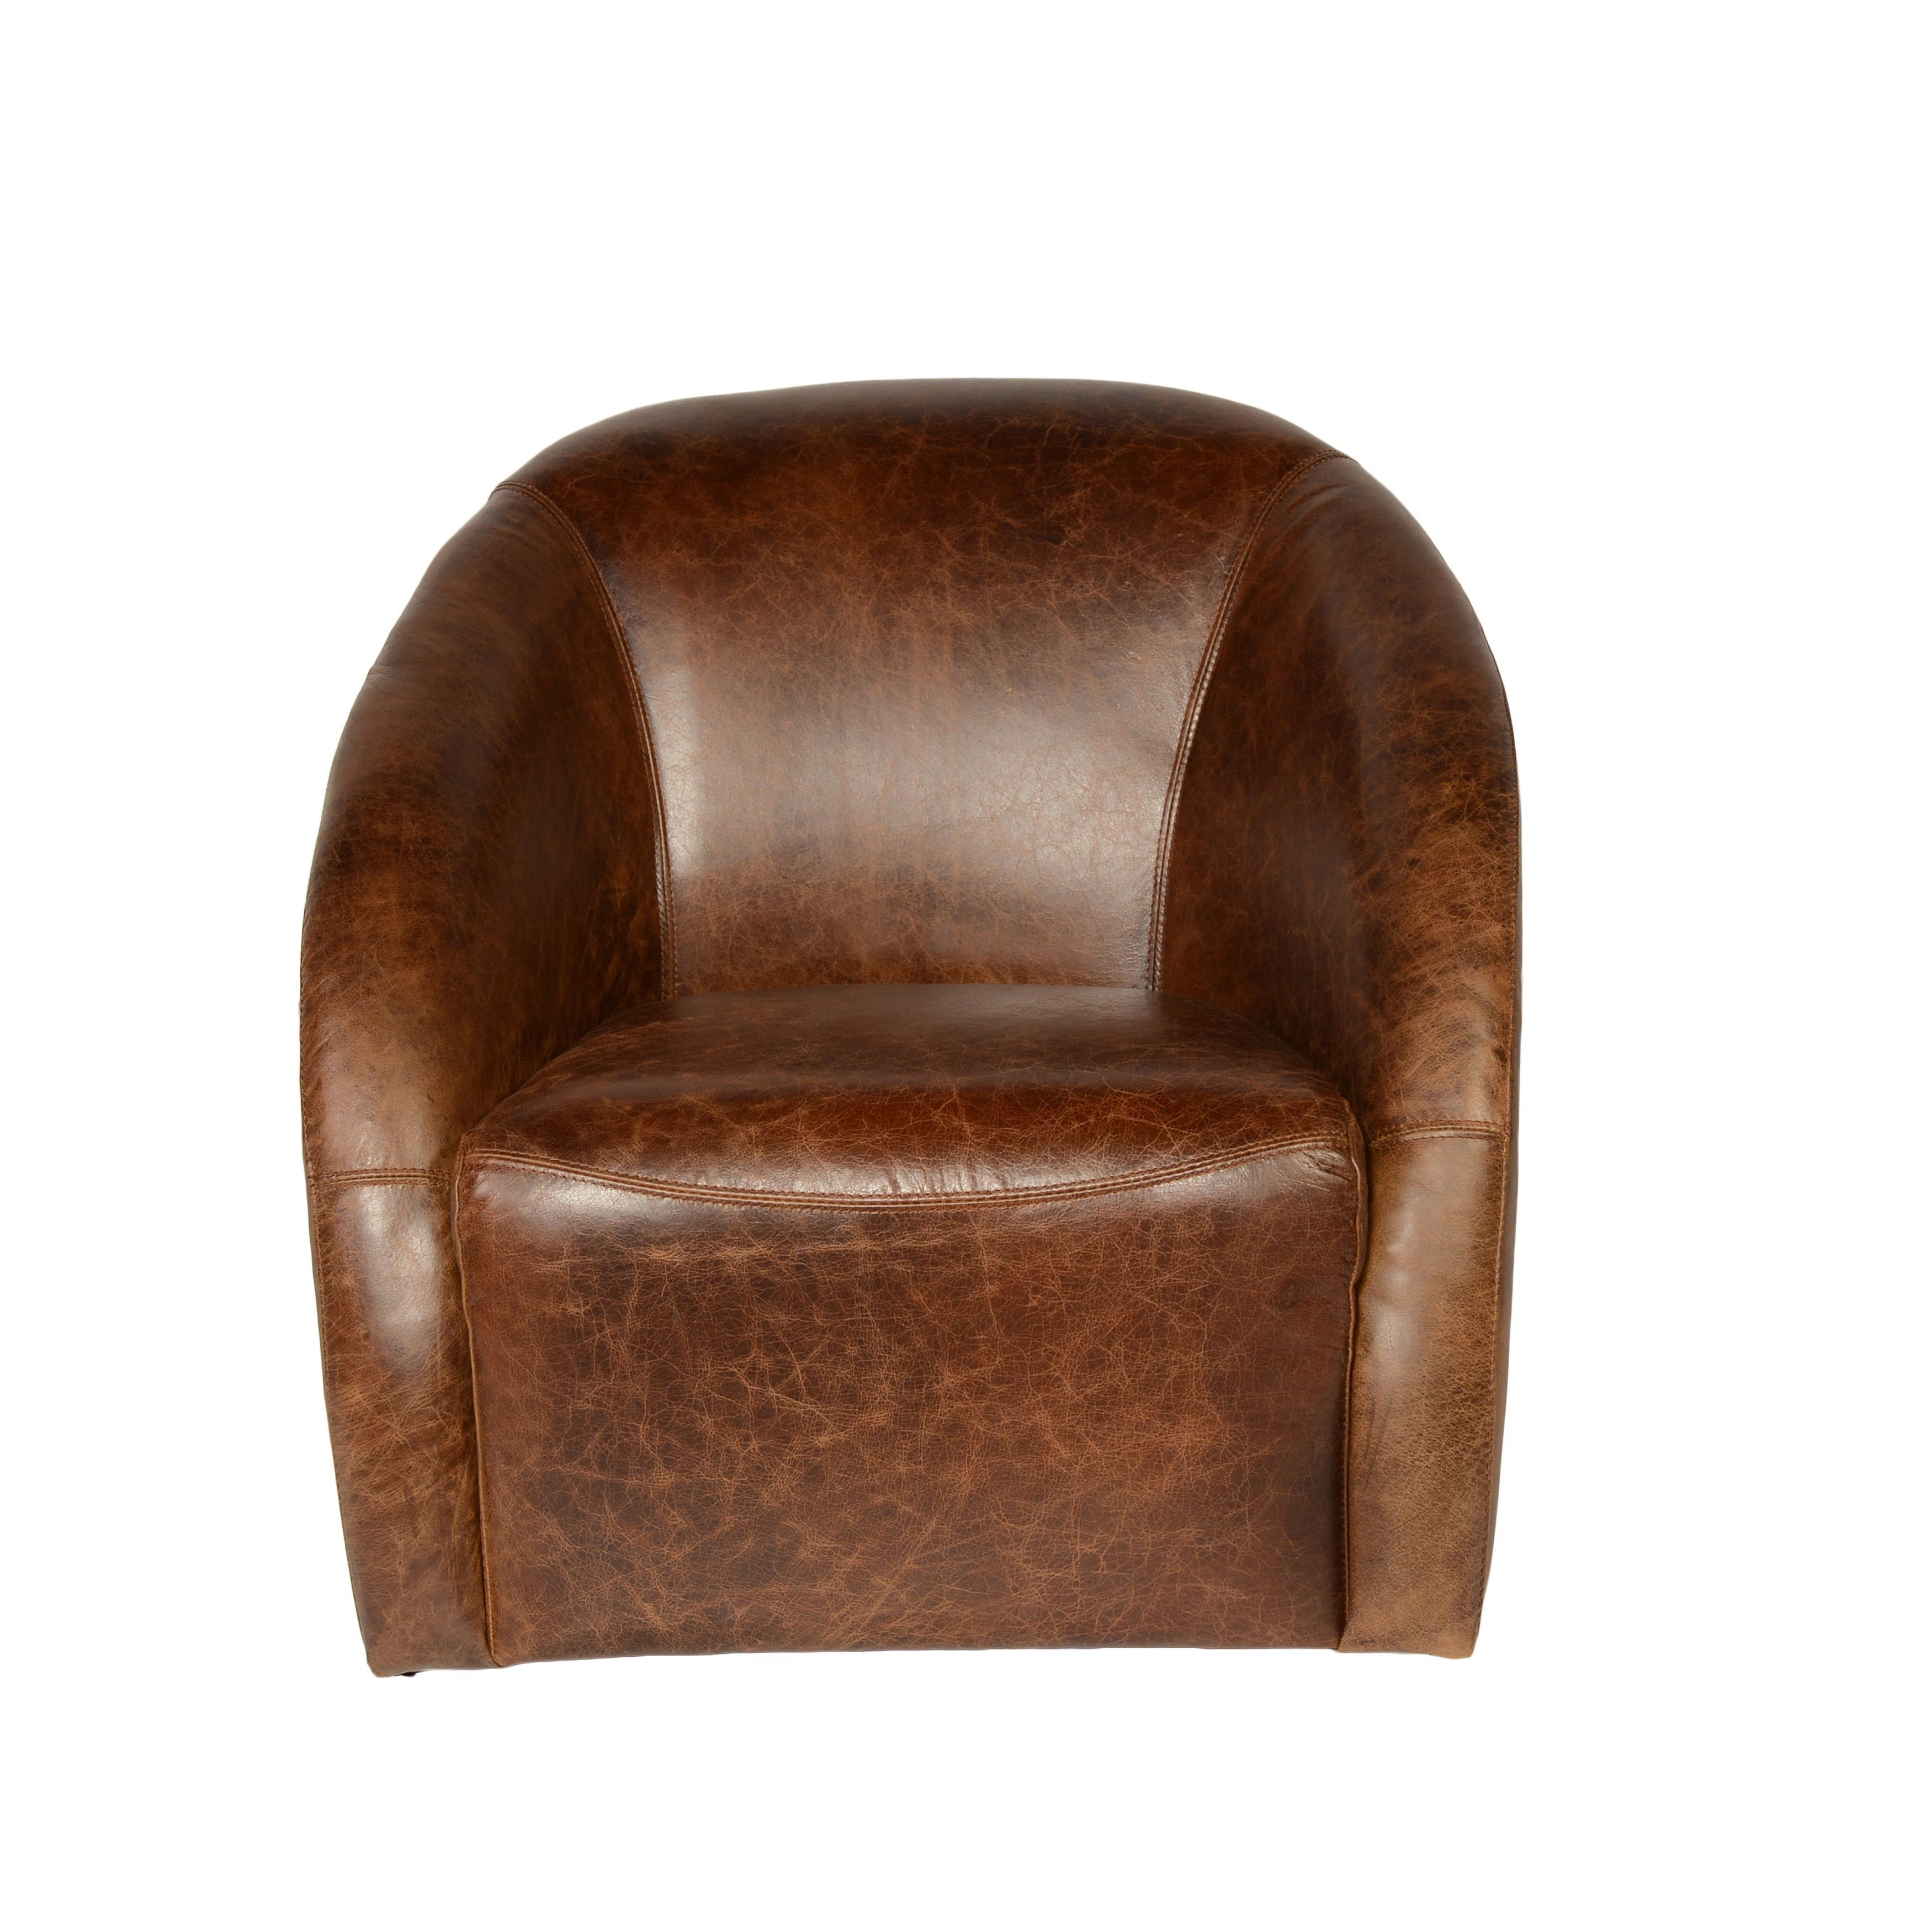 Lazzaro Leather Maryland Coco Brompton Swivel Tub Chair (Brown Leather Swivel  Tub Chair) (